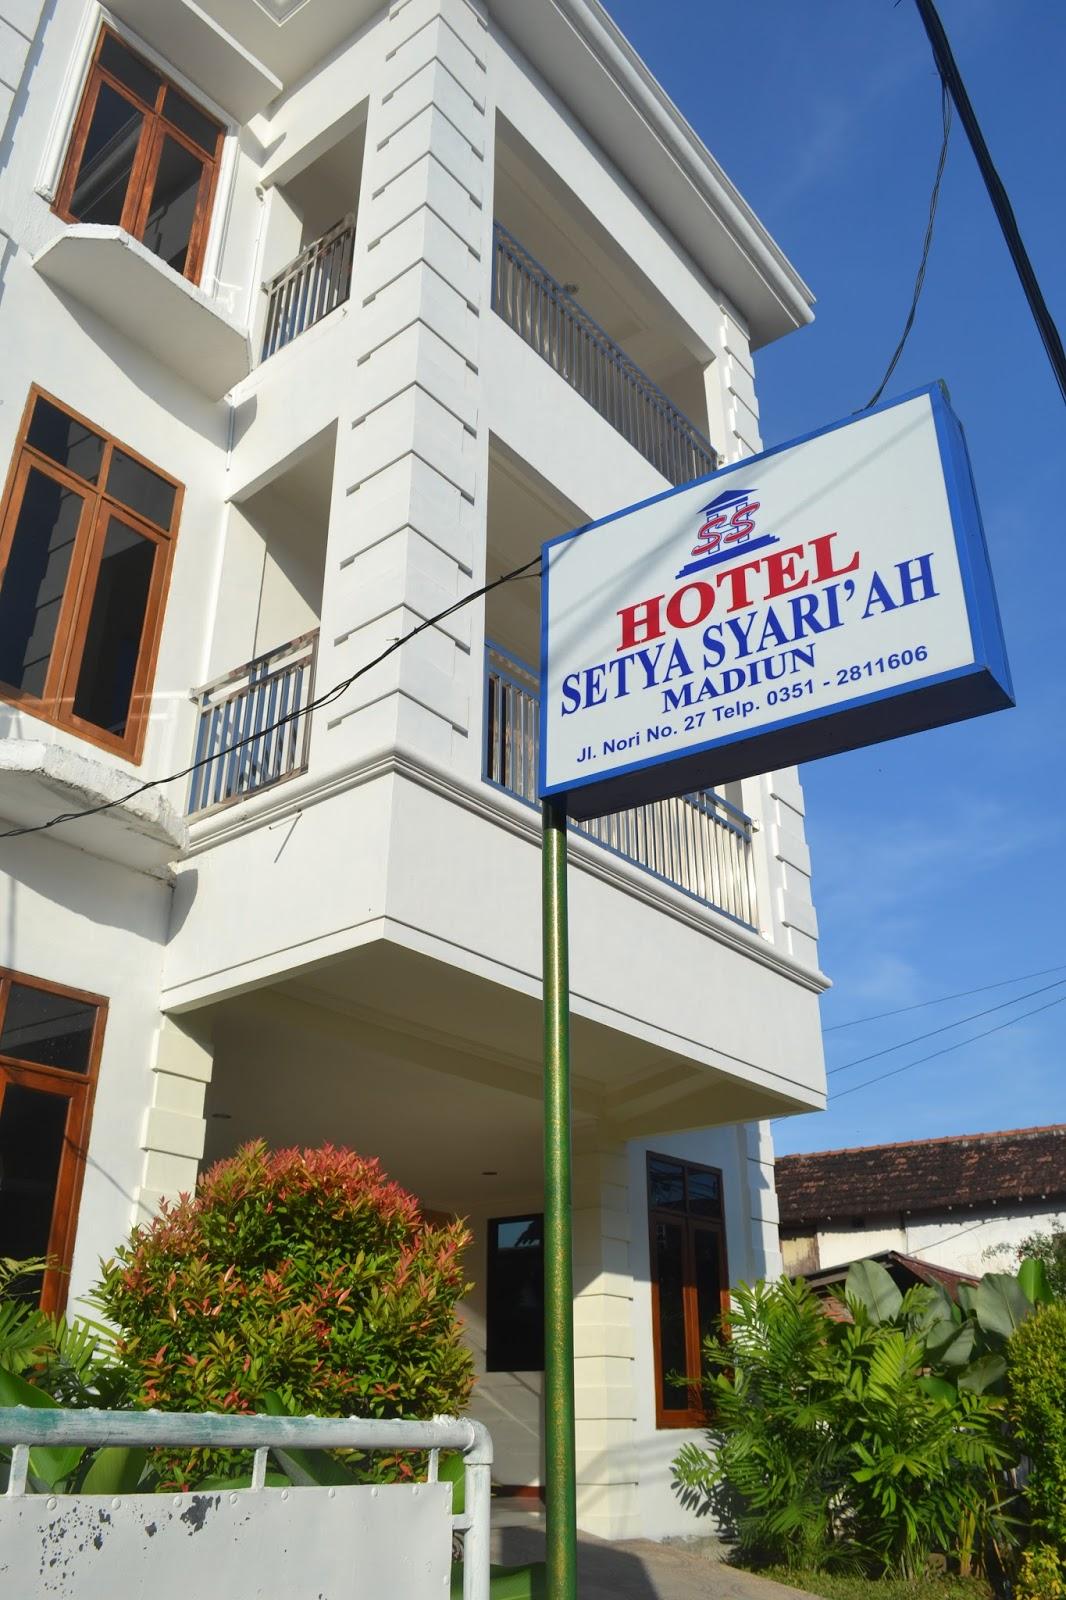 Hotel Setya Syariah